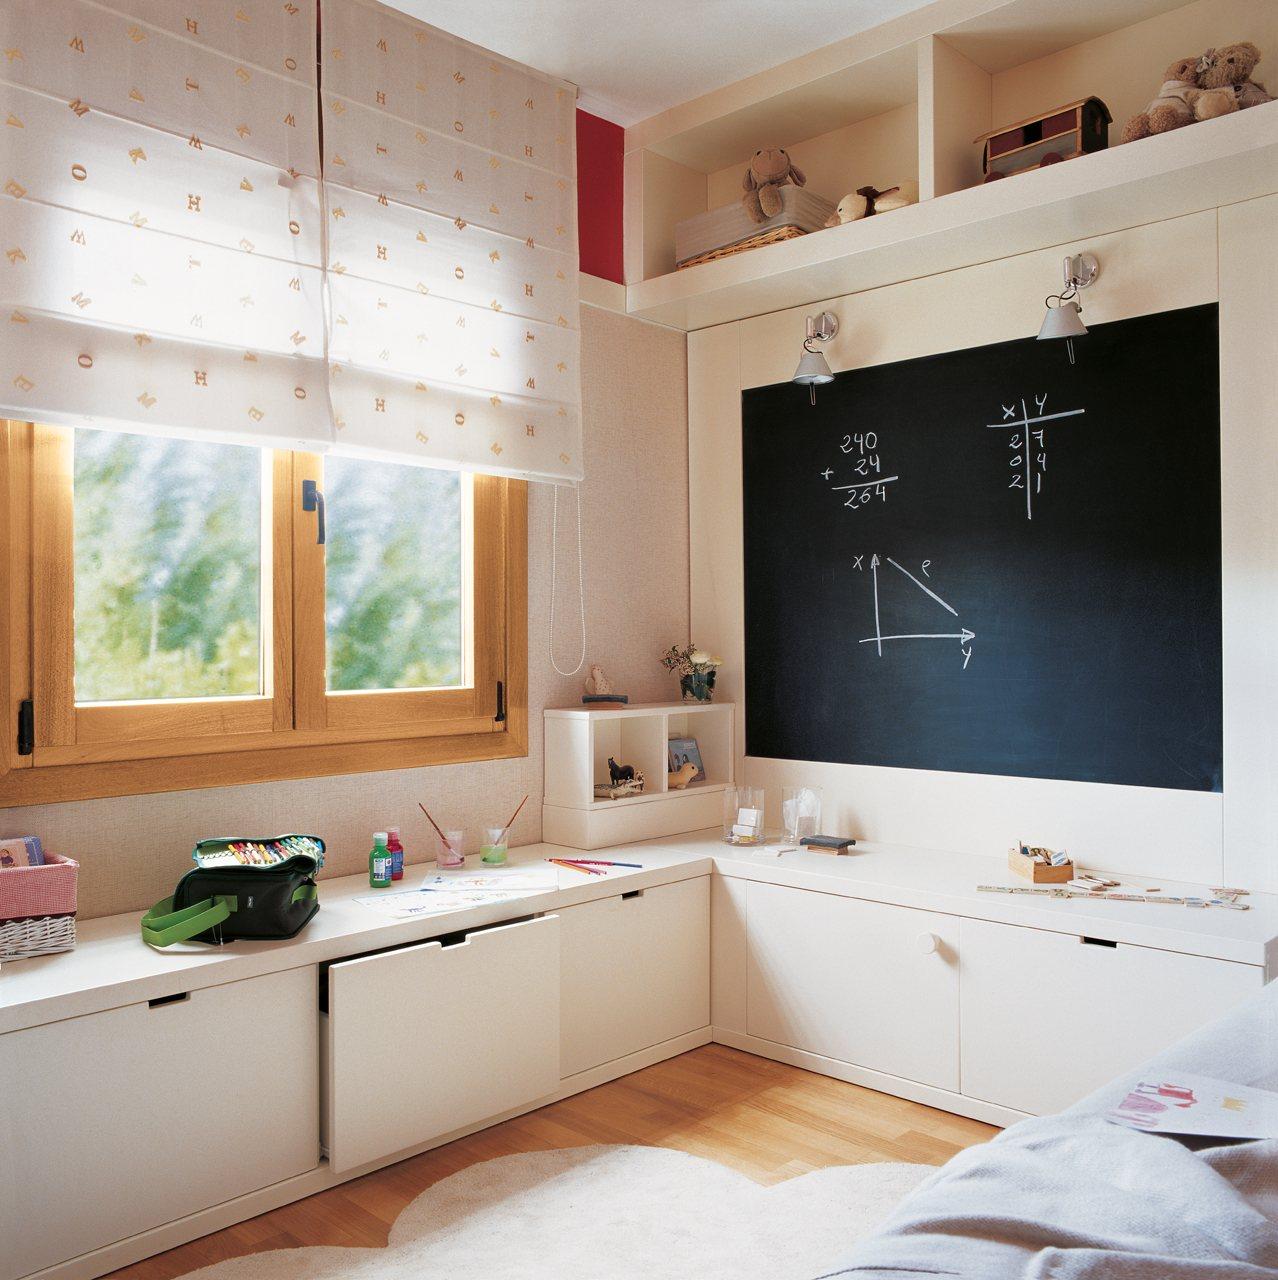 Dormitorios infantiles peque os s cales partido for Decoracion de espacios para ninos